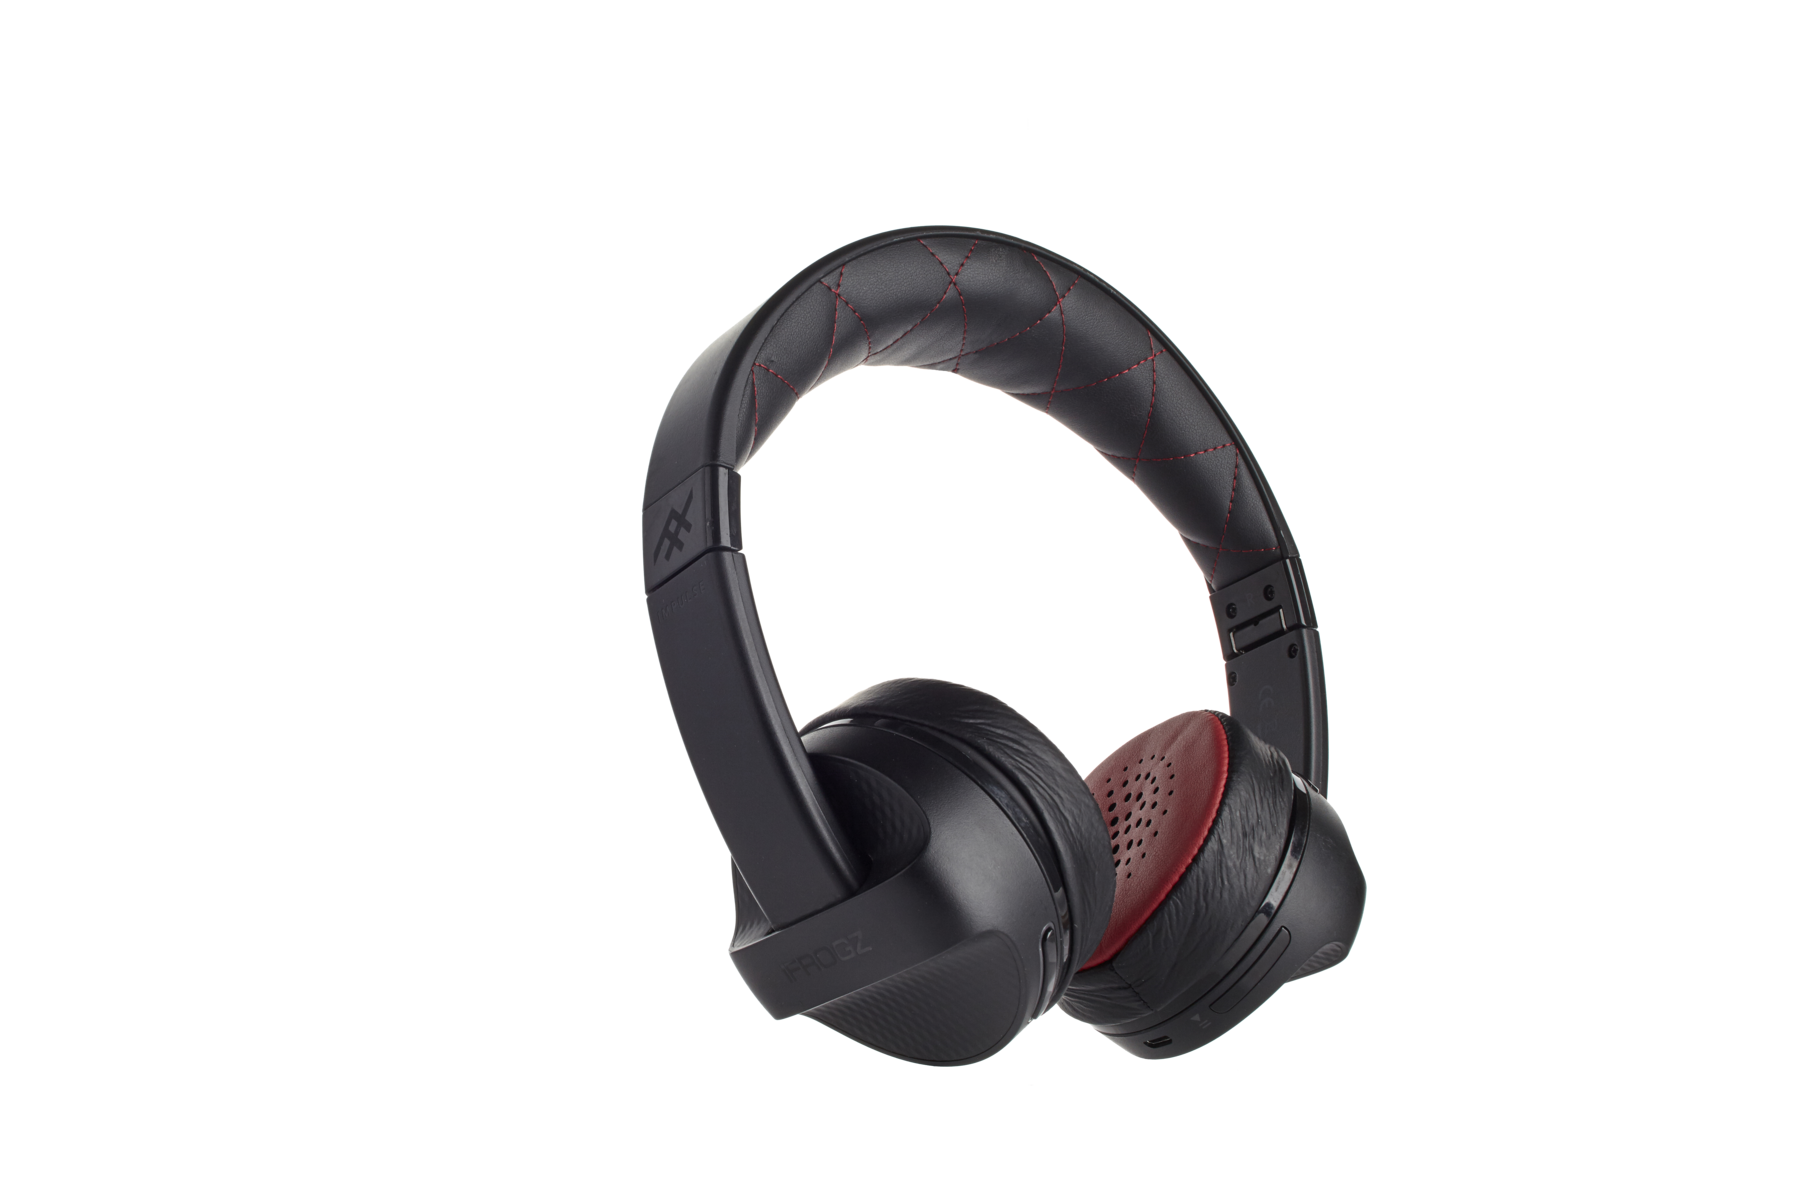 New Impulse Wireless Headphones From Ifrogz